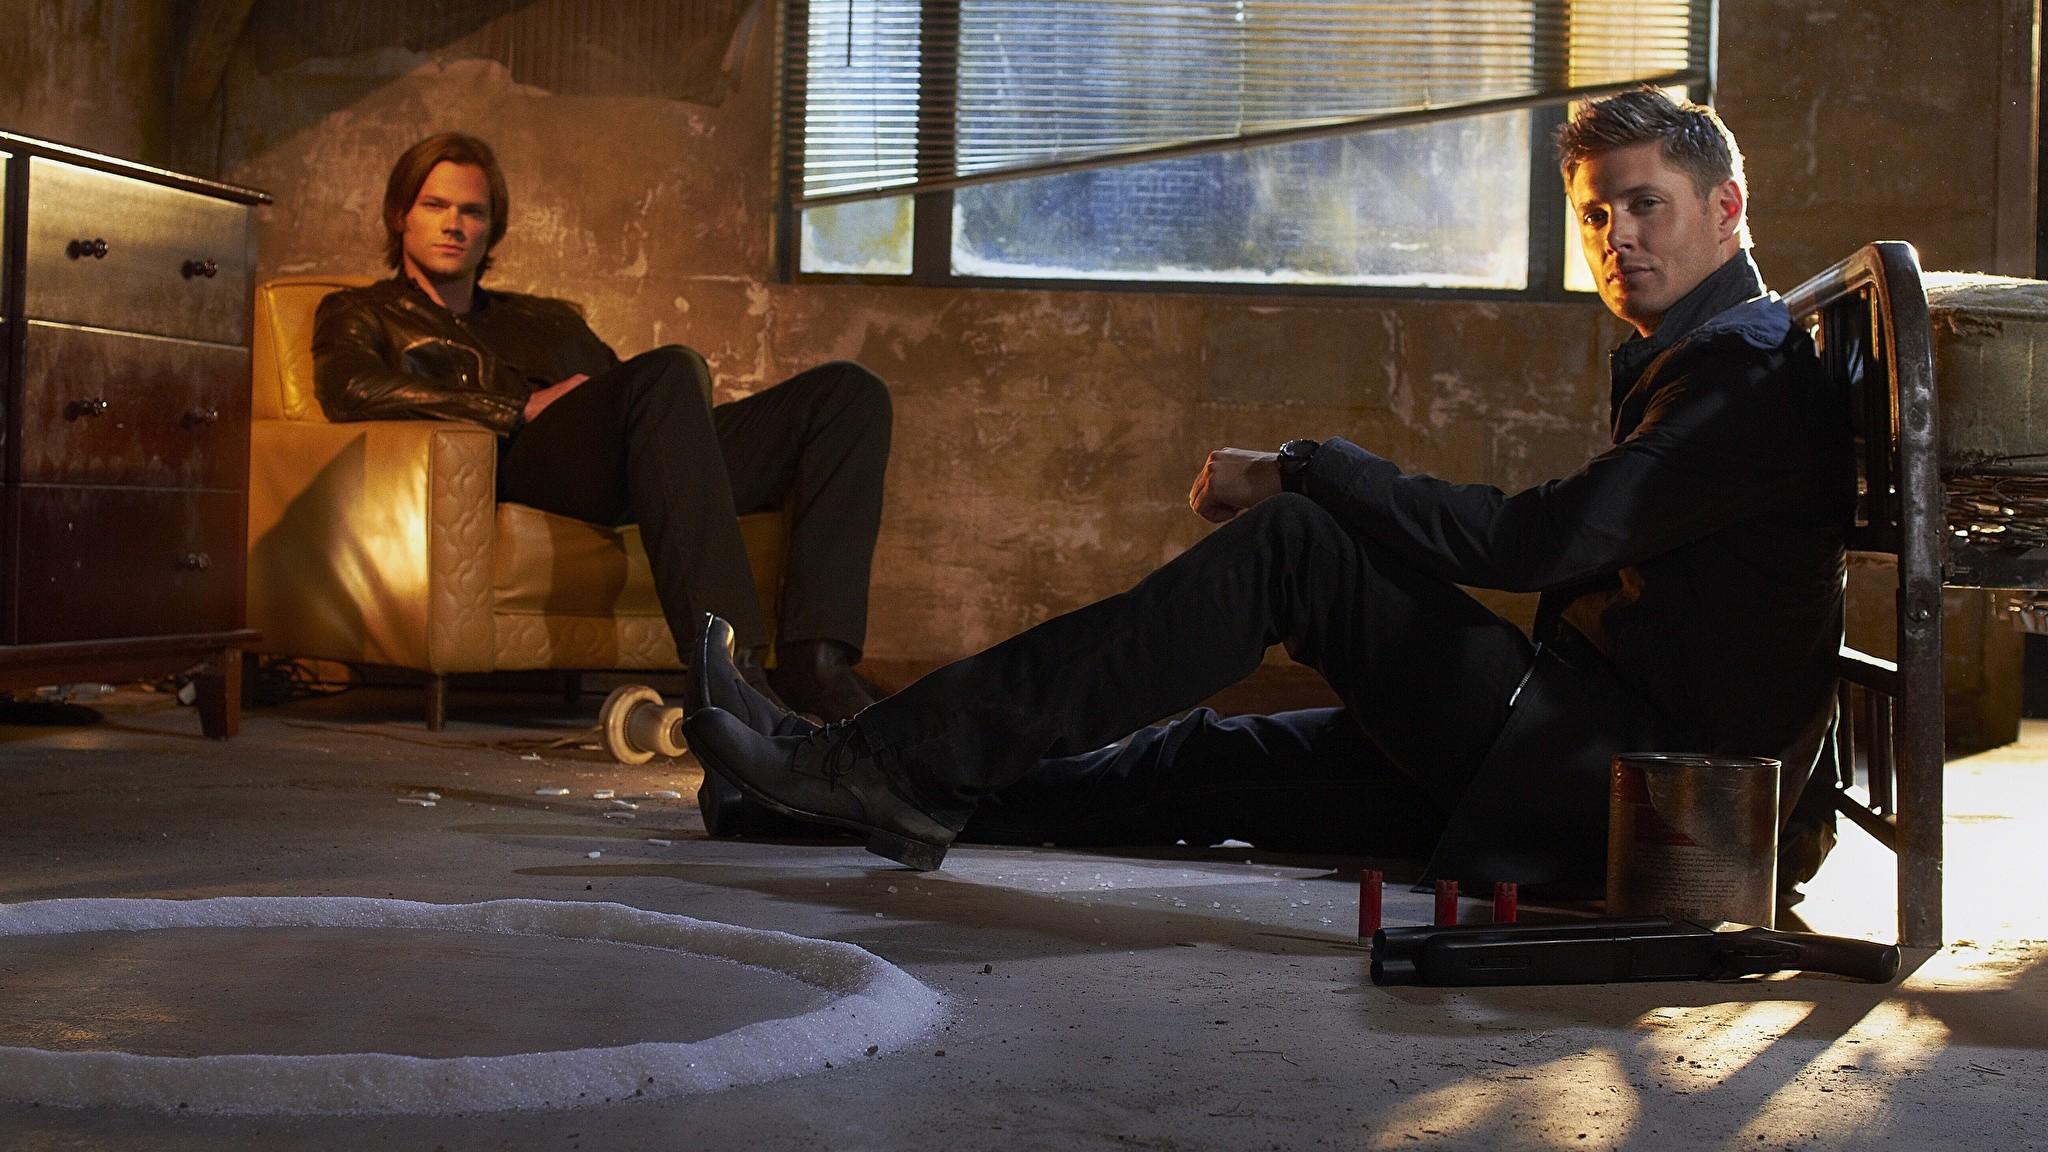 Images Supernatural Jensen Ackles Jared Padalecki Men Movies Sitting  Celebrities Man